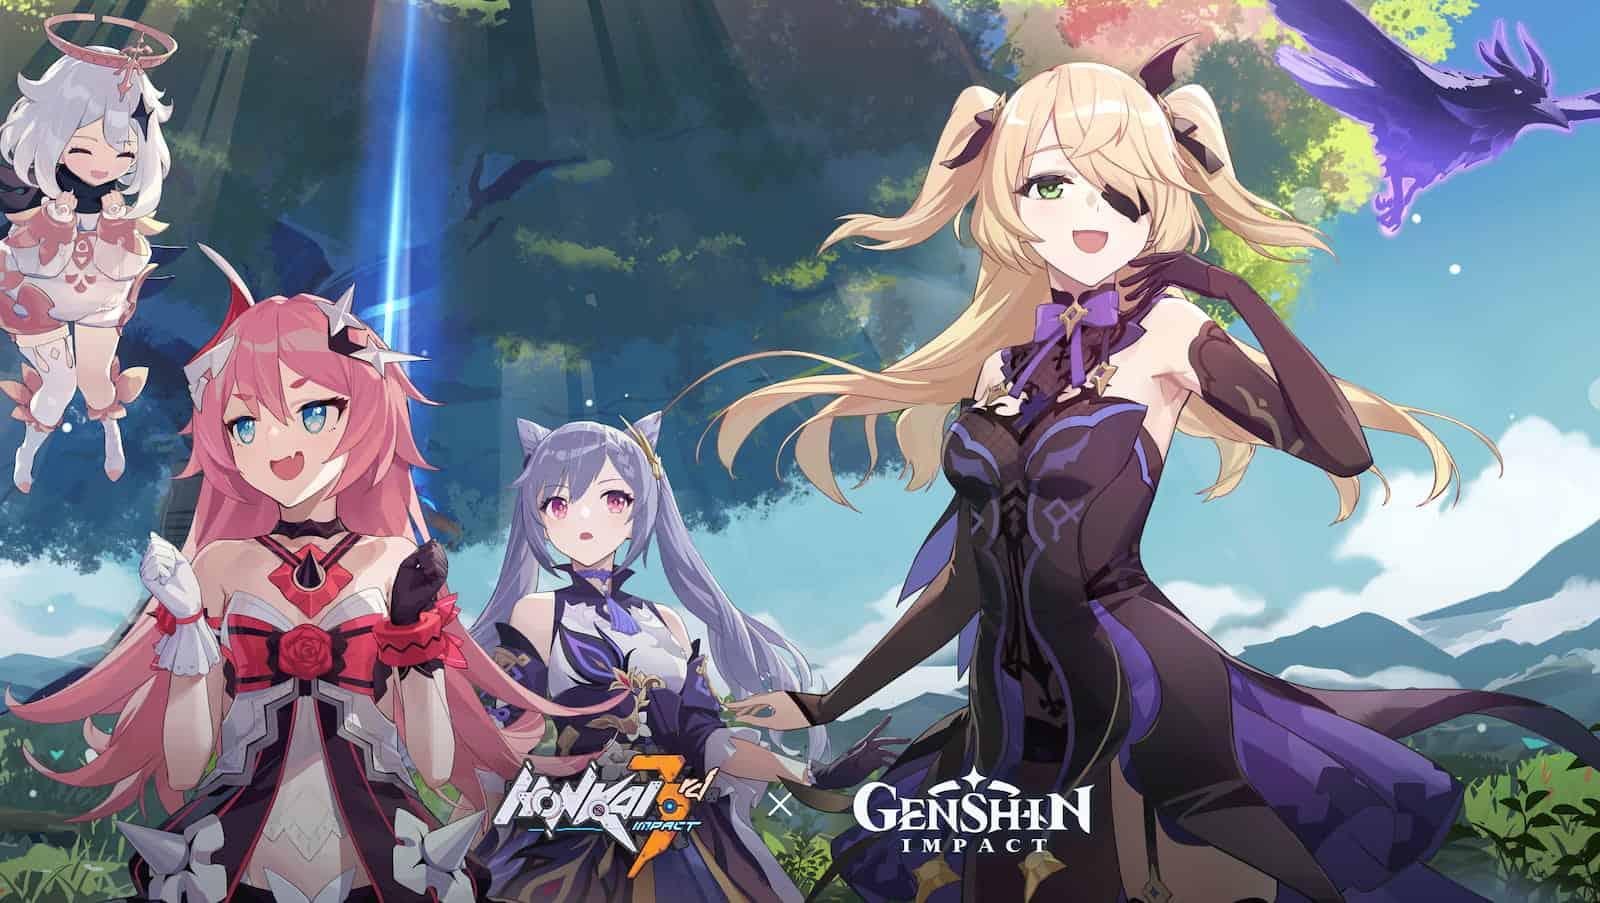 Honkai Impact 3rd Genshin Impact Crossover 2